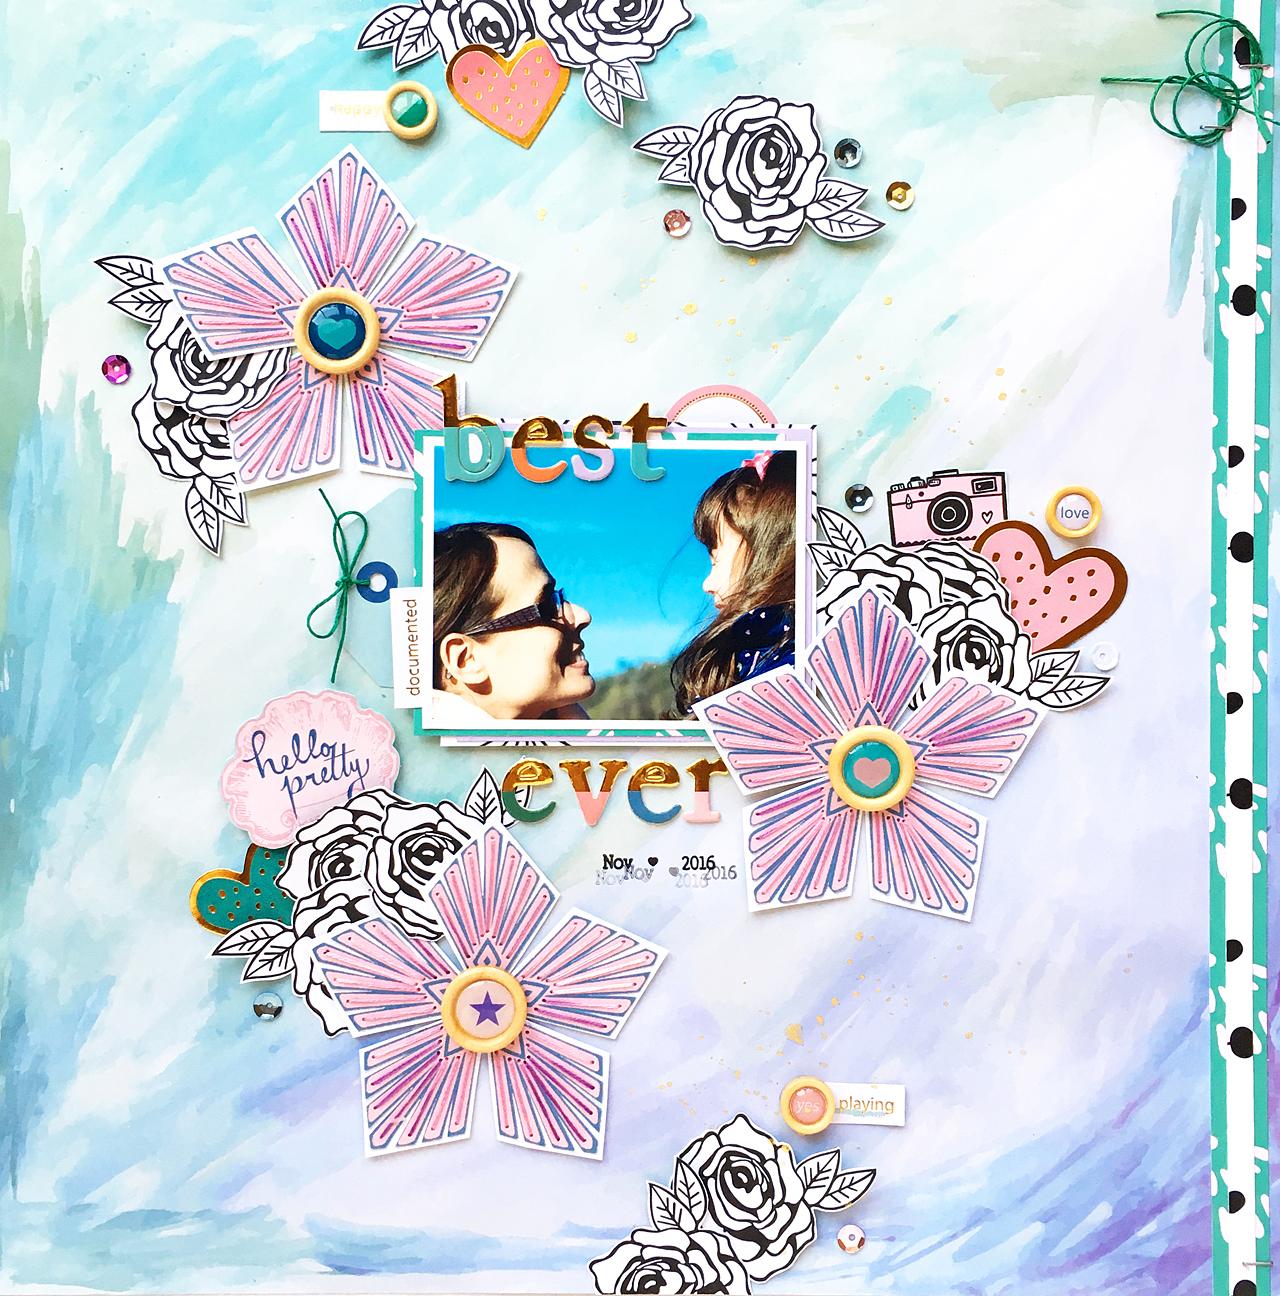 Enza Gudor - Storytime - Post 2.jpg